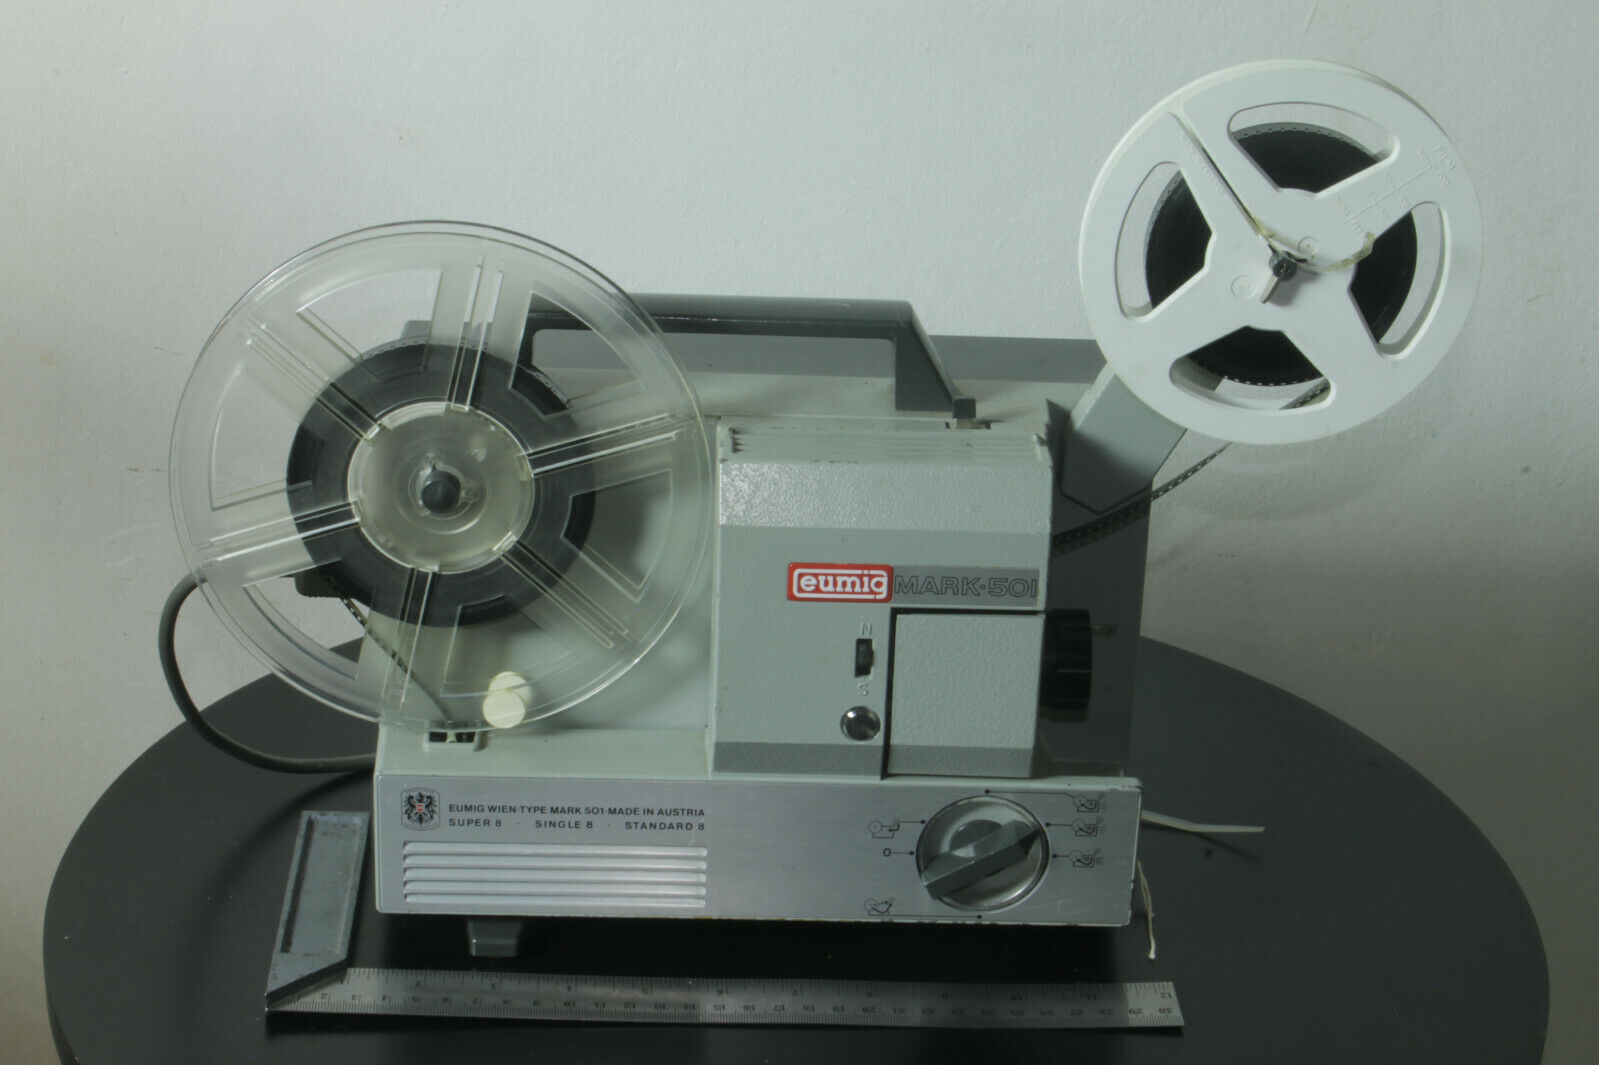 Vintage EUMIG MARK 501 8mm/Super 8mm Cine Film Projector Working with Test Film